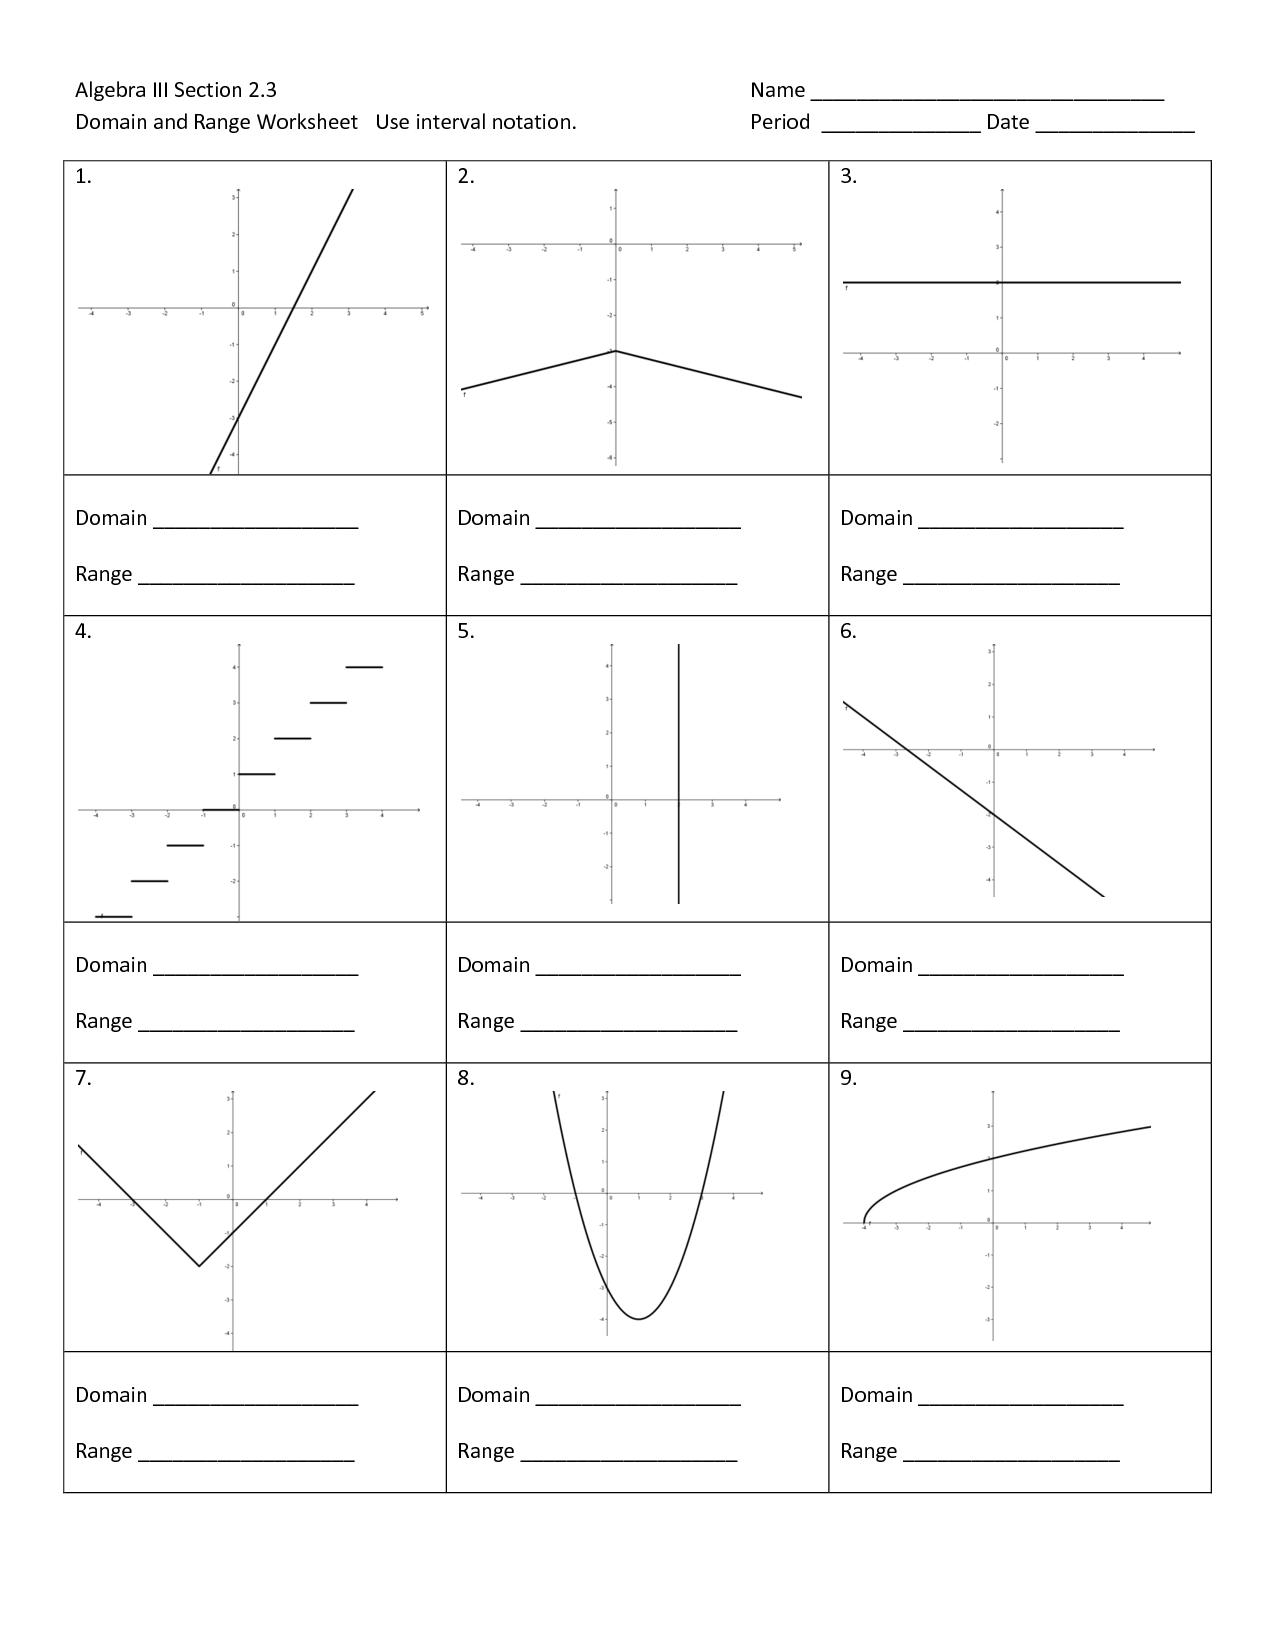 Algebra 1 Worksheets Domain and Range Worksheets ...